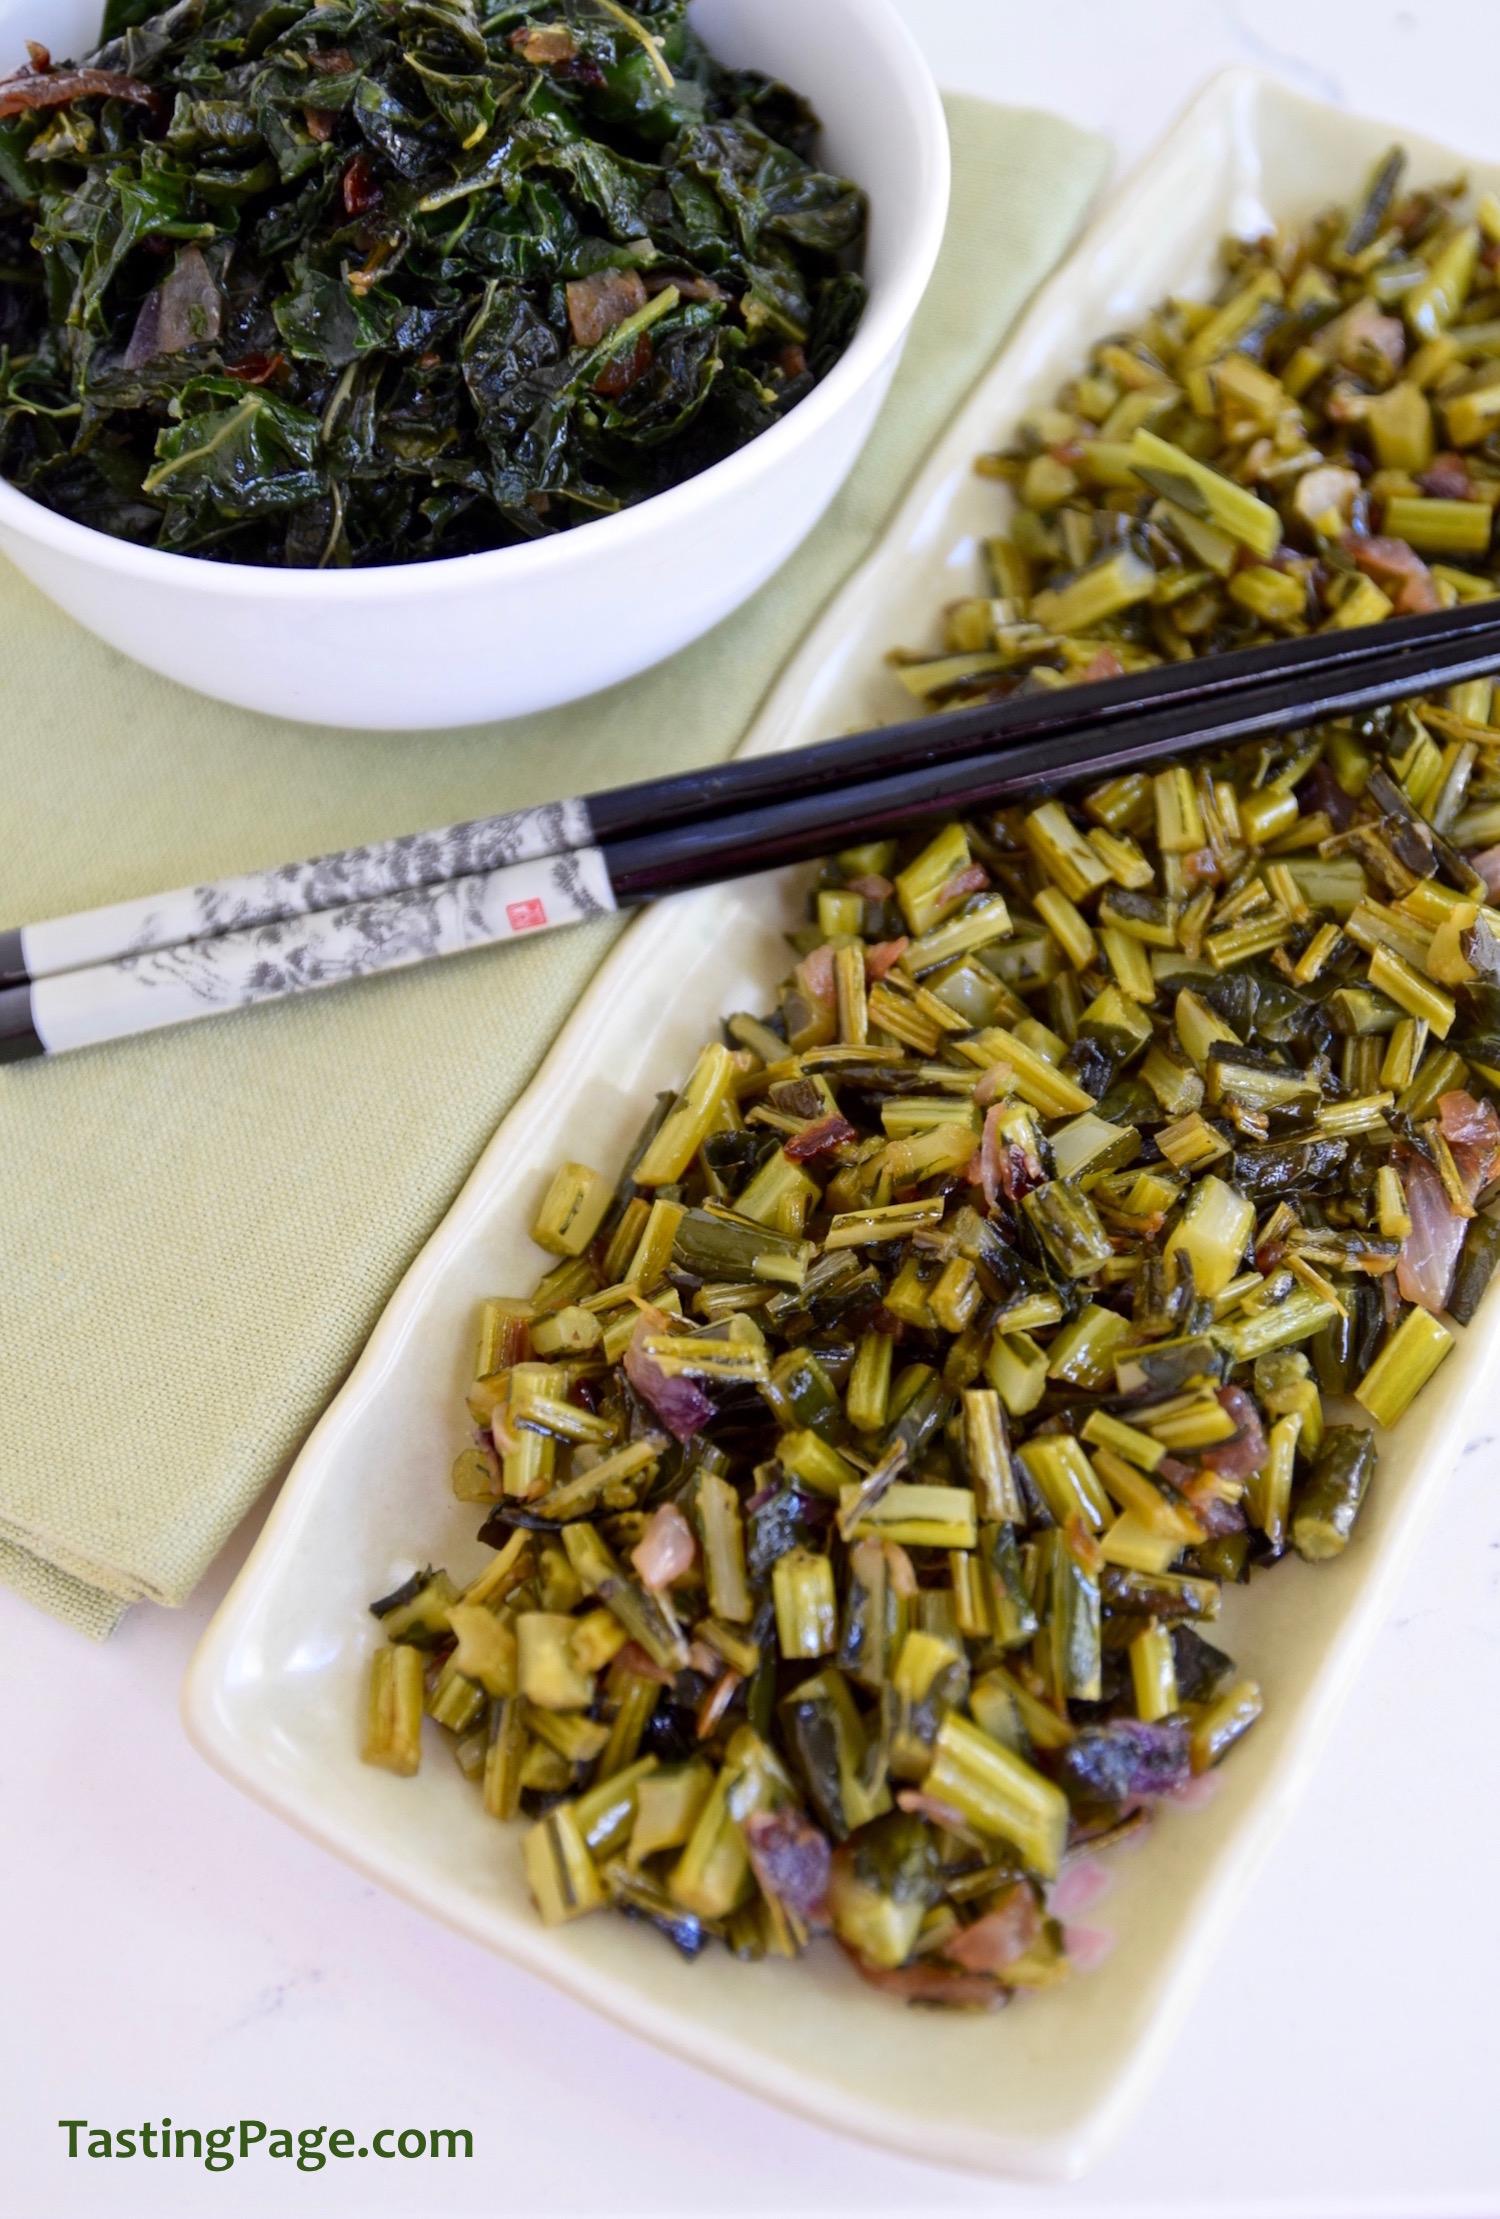 Smoky Sauteed Kale Stems   TastingPage.com